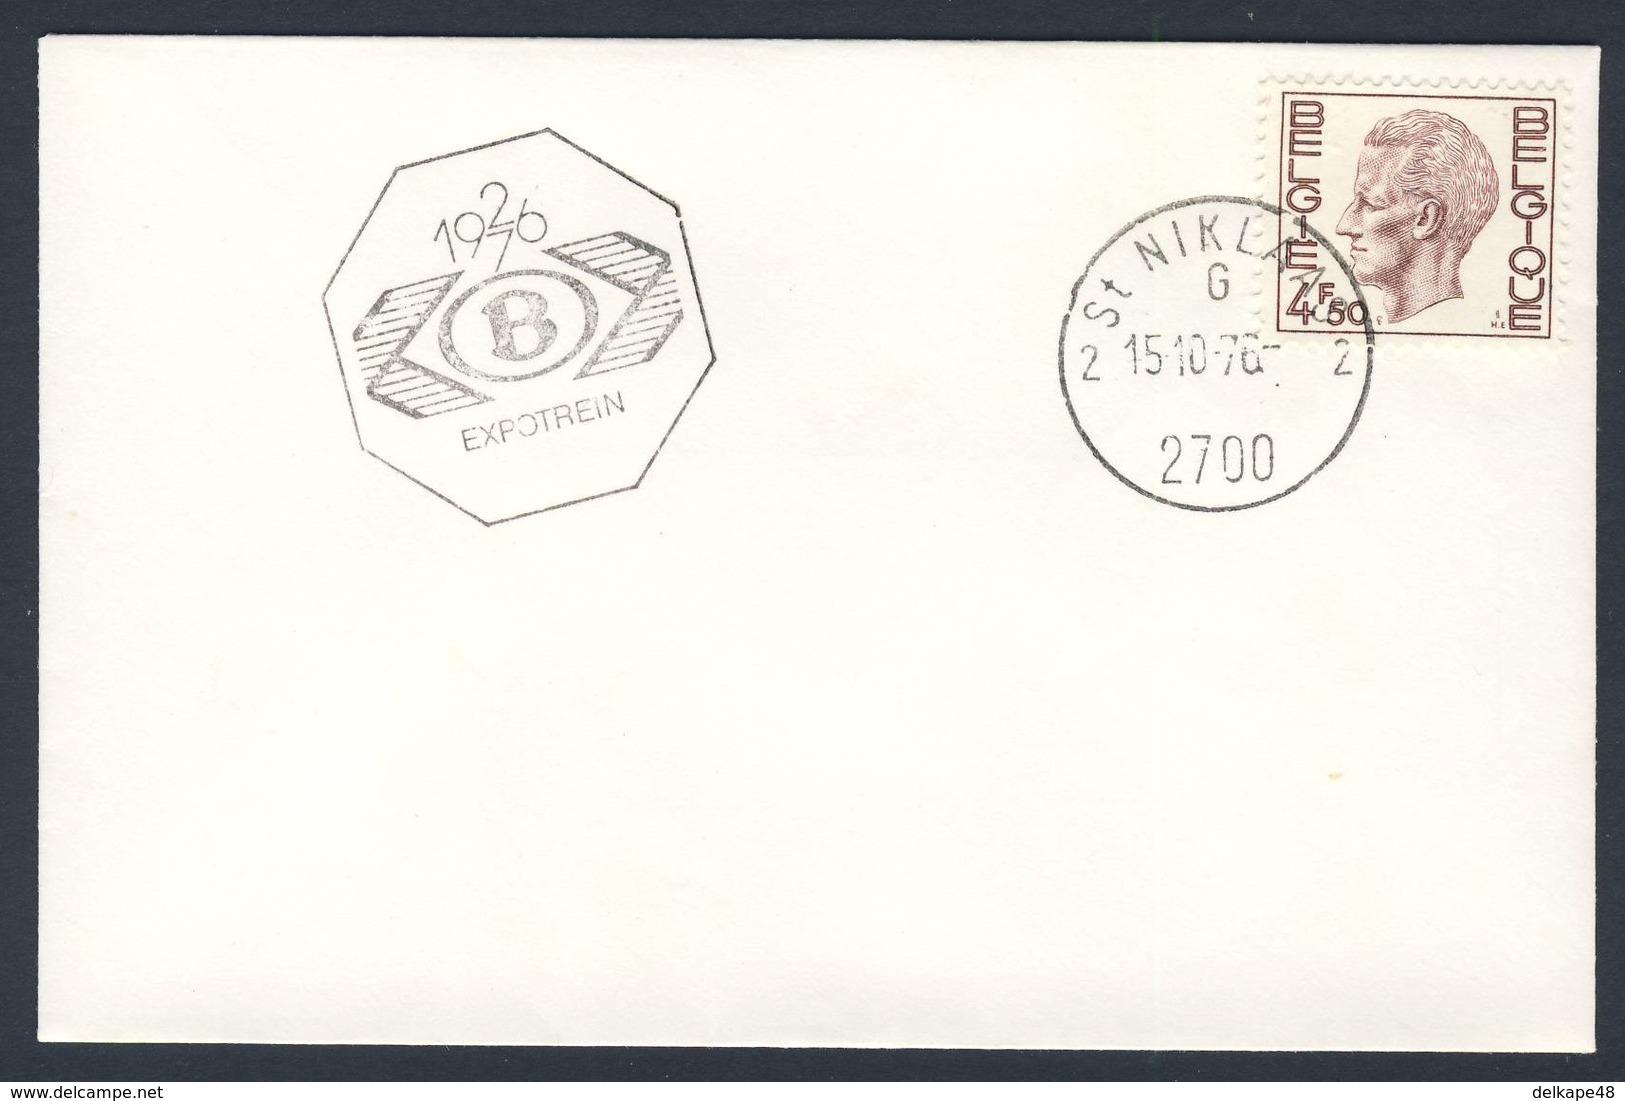 Belgie Belgique Belgium 1976 Cover Brief Enveloppe - EXPOTREIN, 1926-1976 , St. Niklaas / Train D'exposition - Treinen